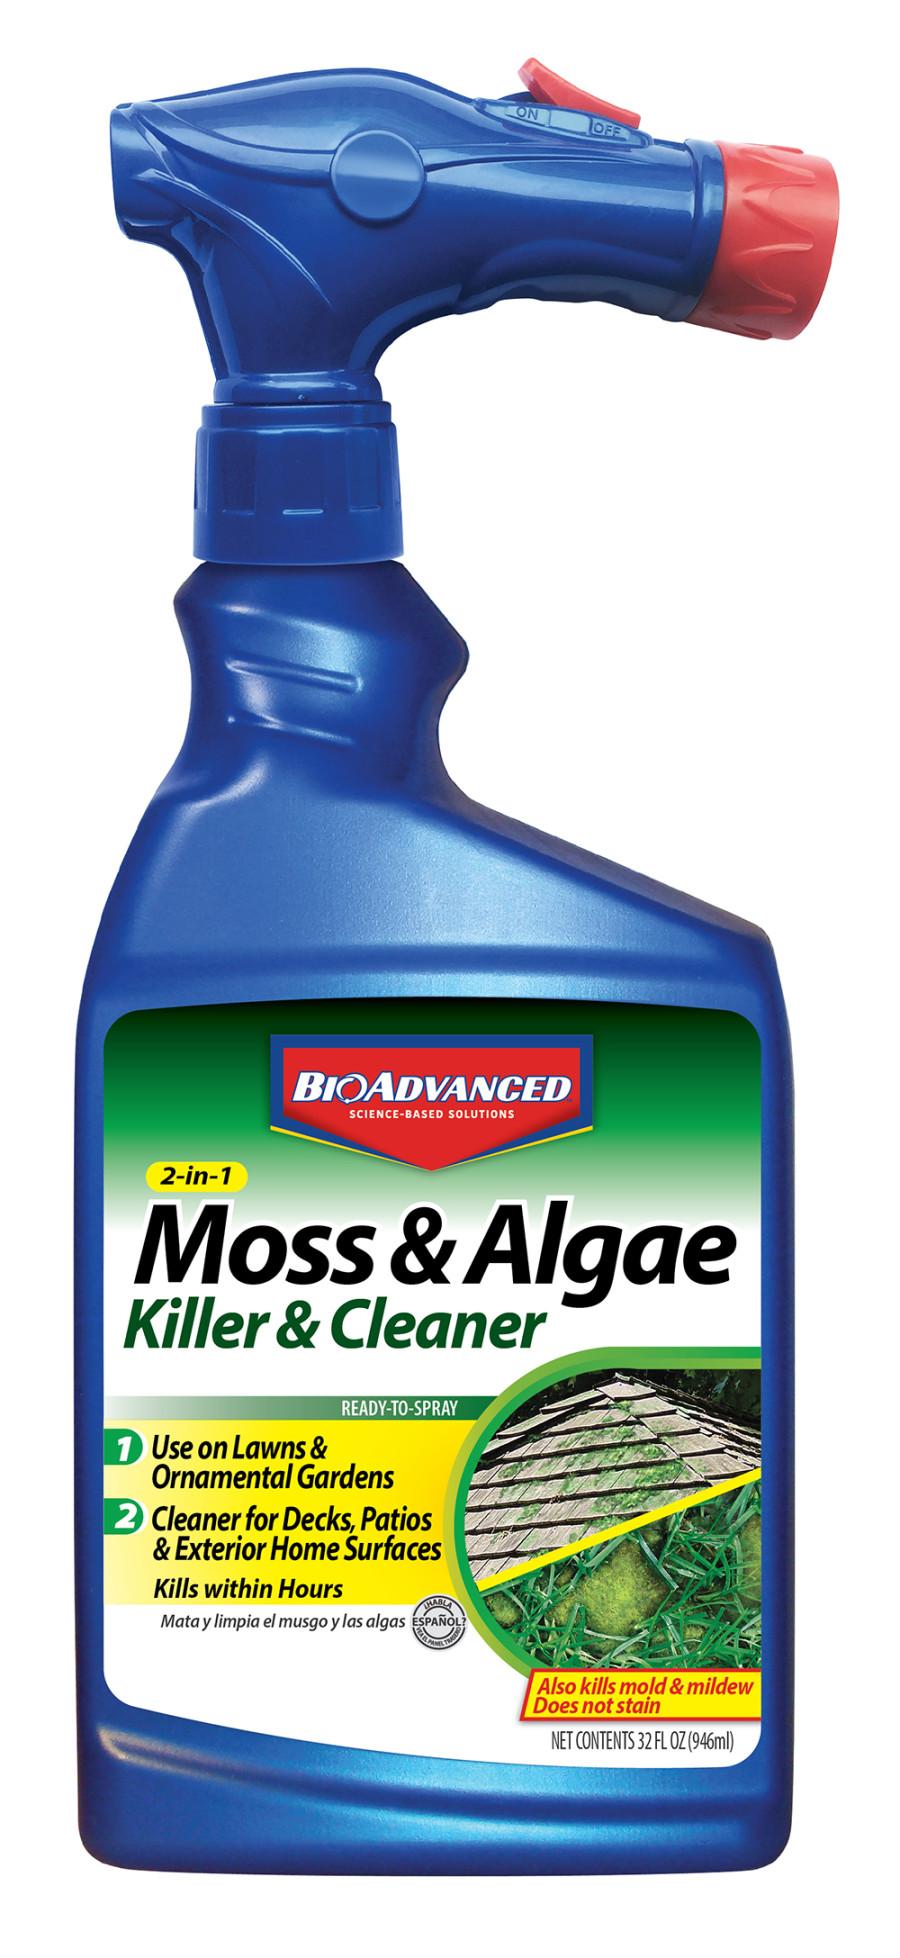 BioAdvanced 2-in-1 Moss & Algae Killer Ready to Spray 8ea/32 oz